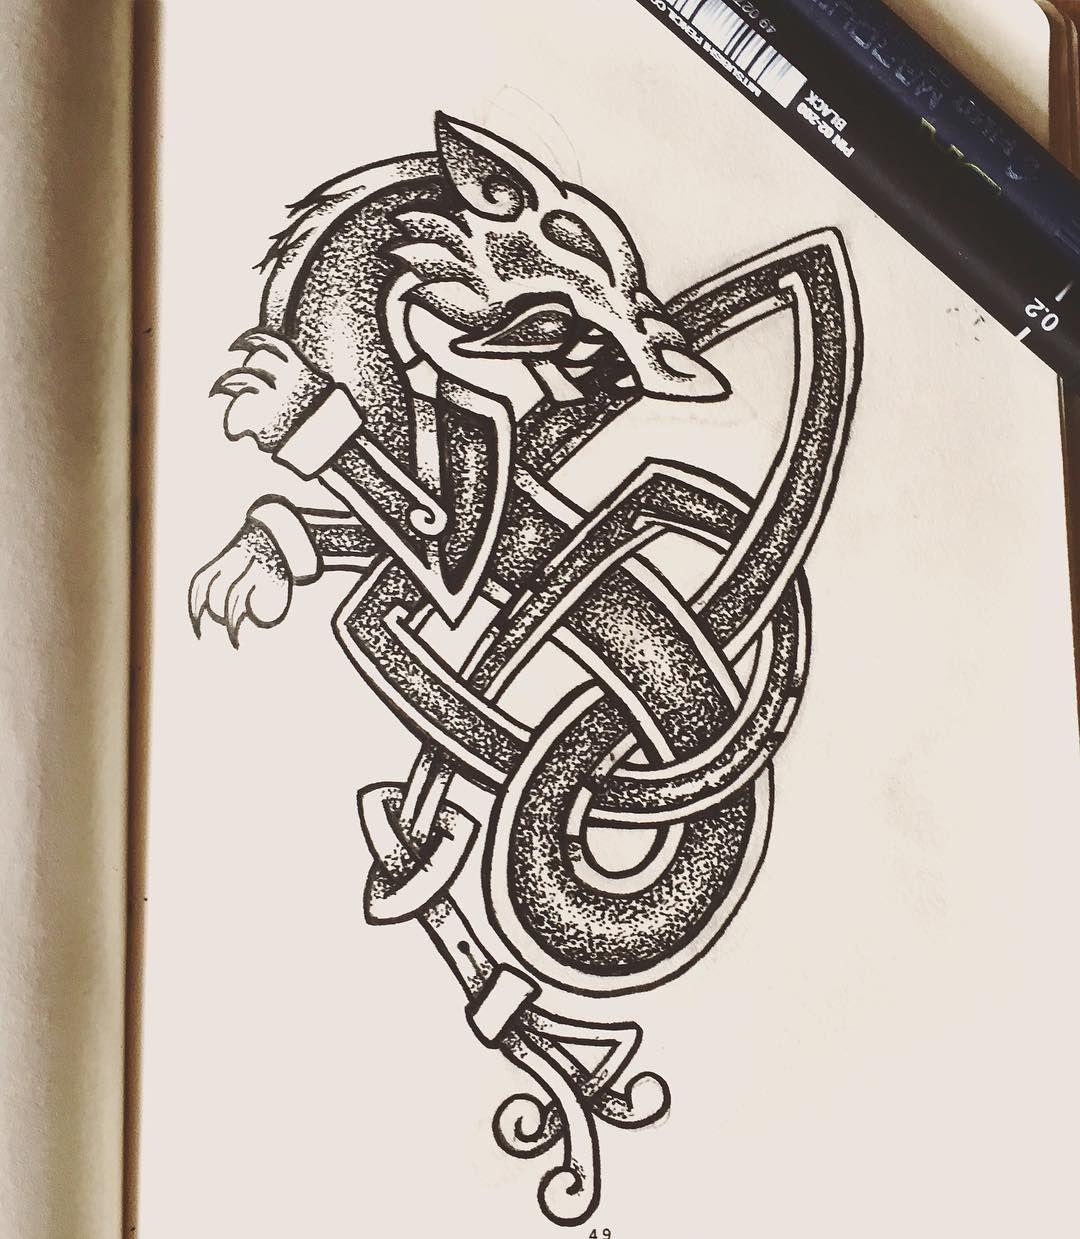 Neo Polytheist Germanic Pagan Tattoos Vikings Tattoos - HD1080×1239